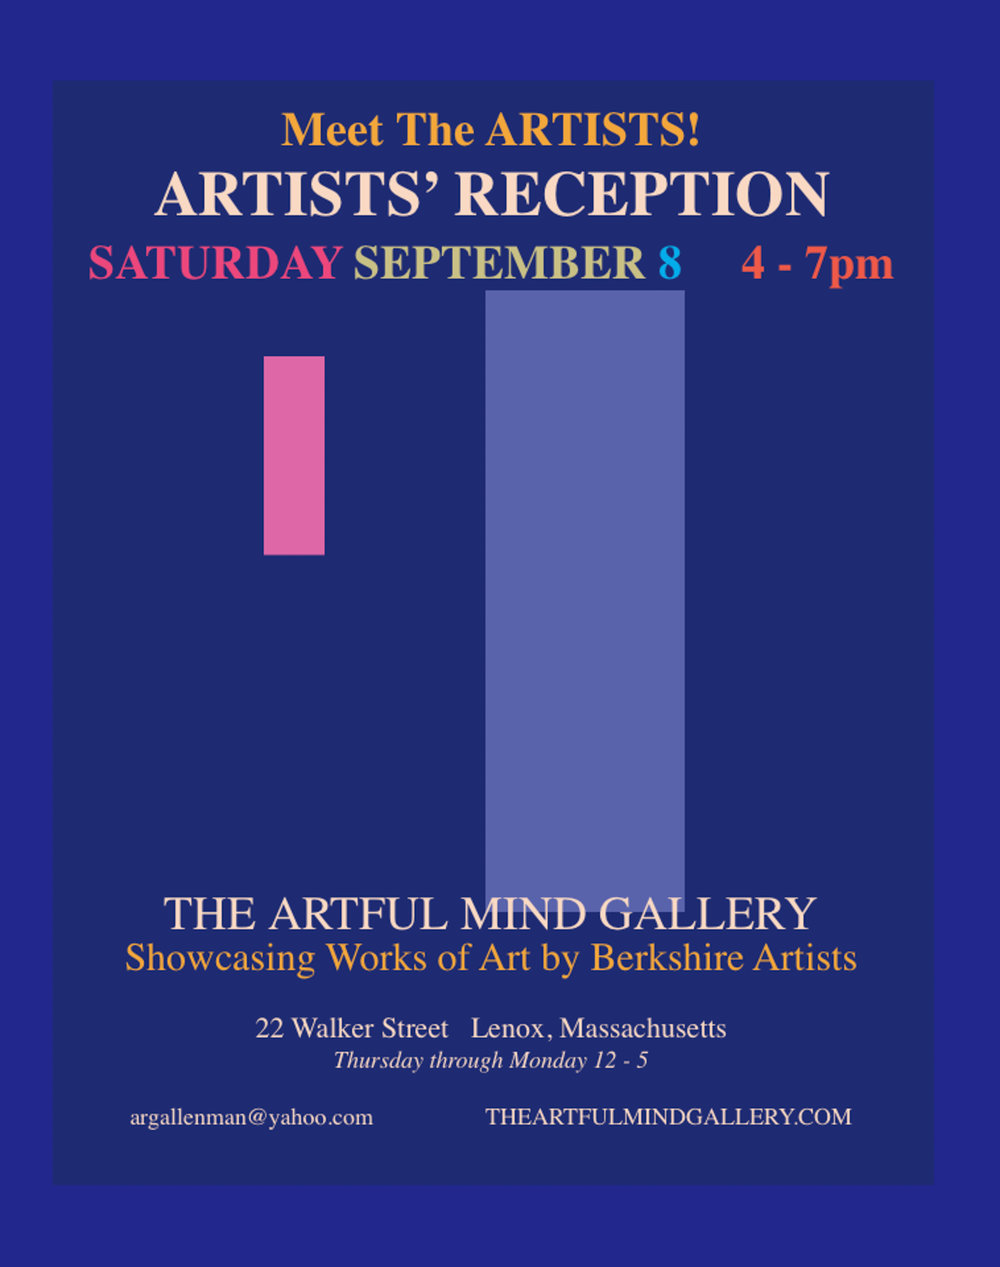 meet the artists invite BBBB 1 (1).jpg